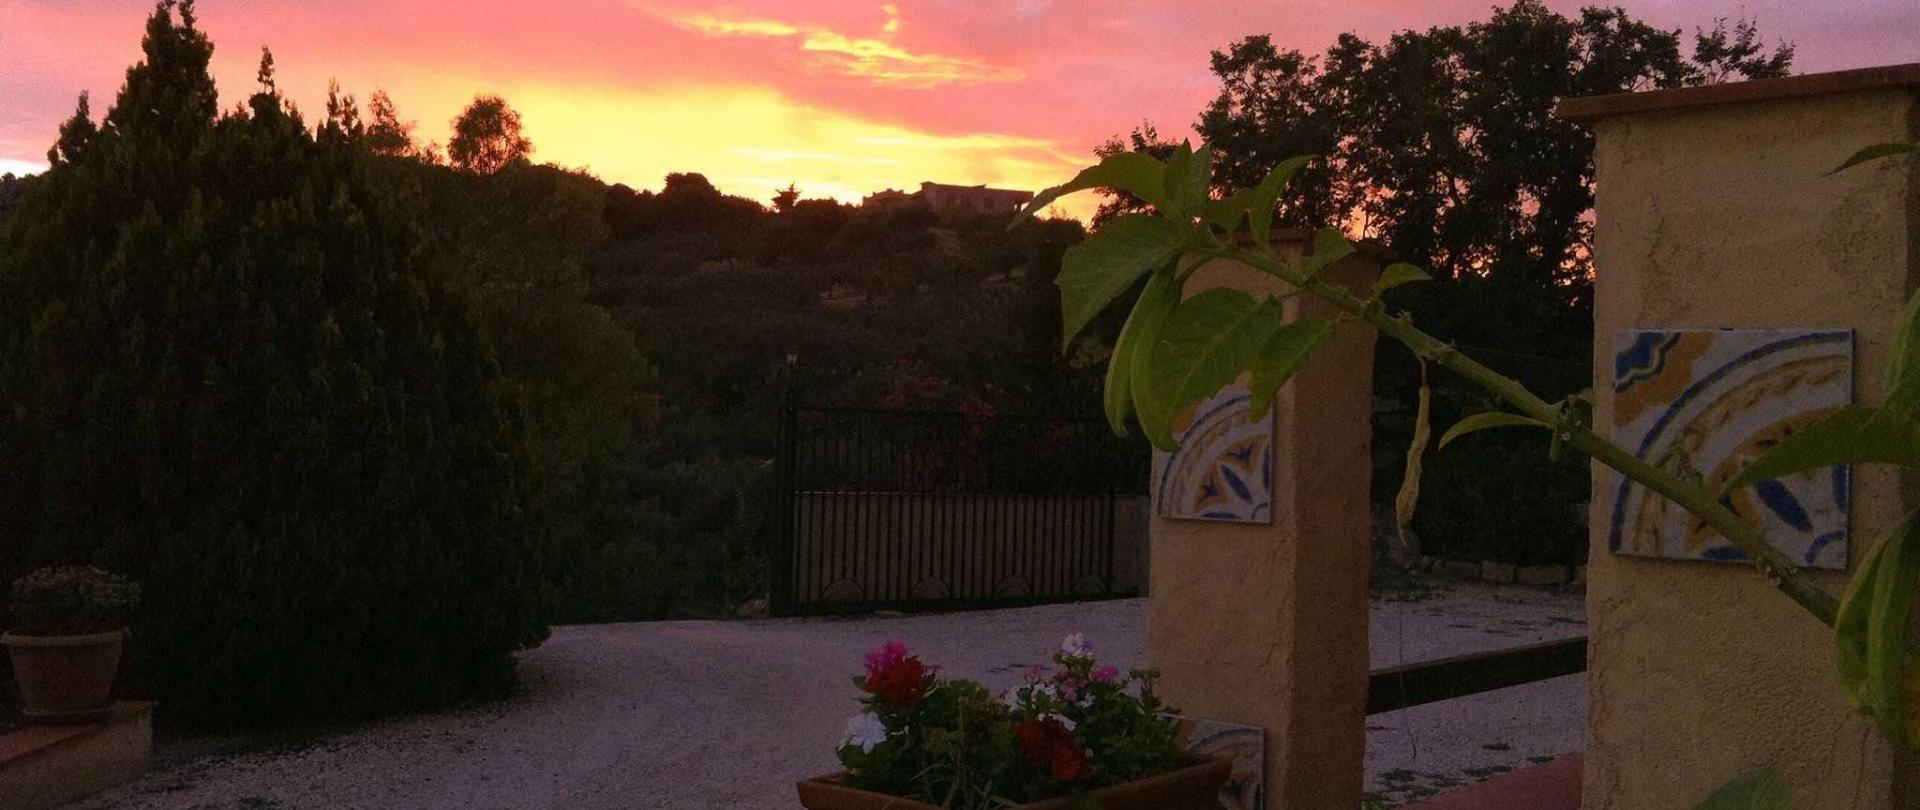 tramonto_sci.jpg